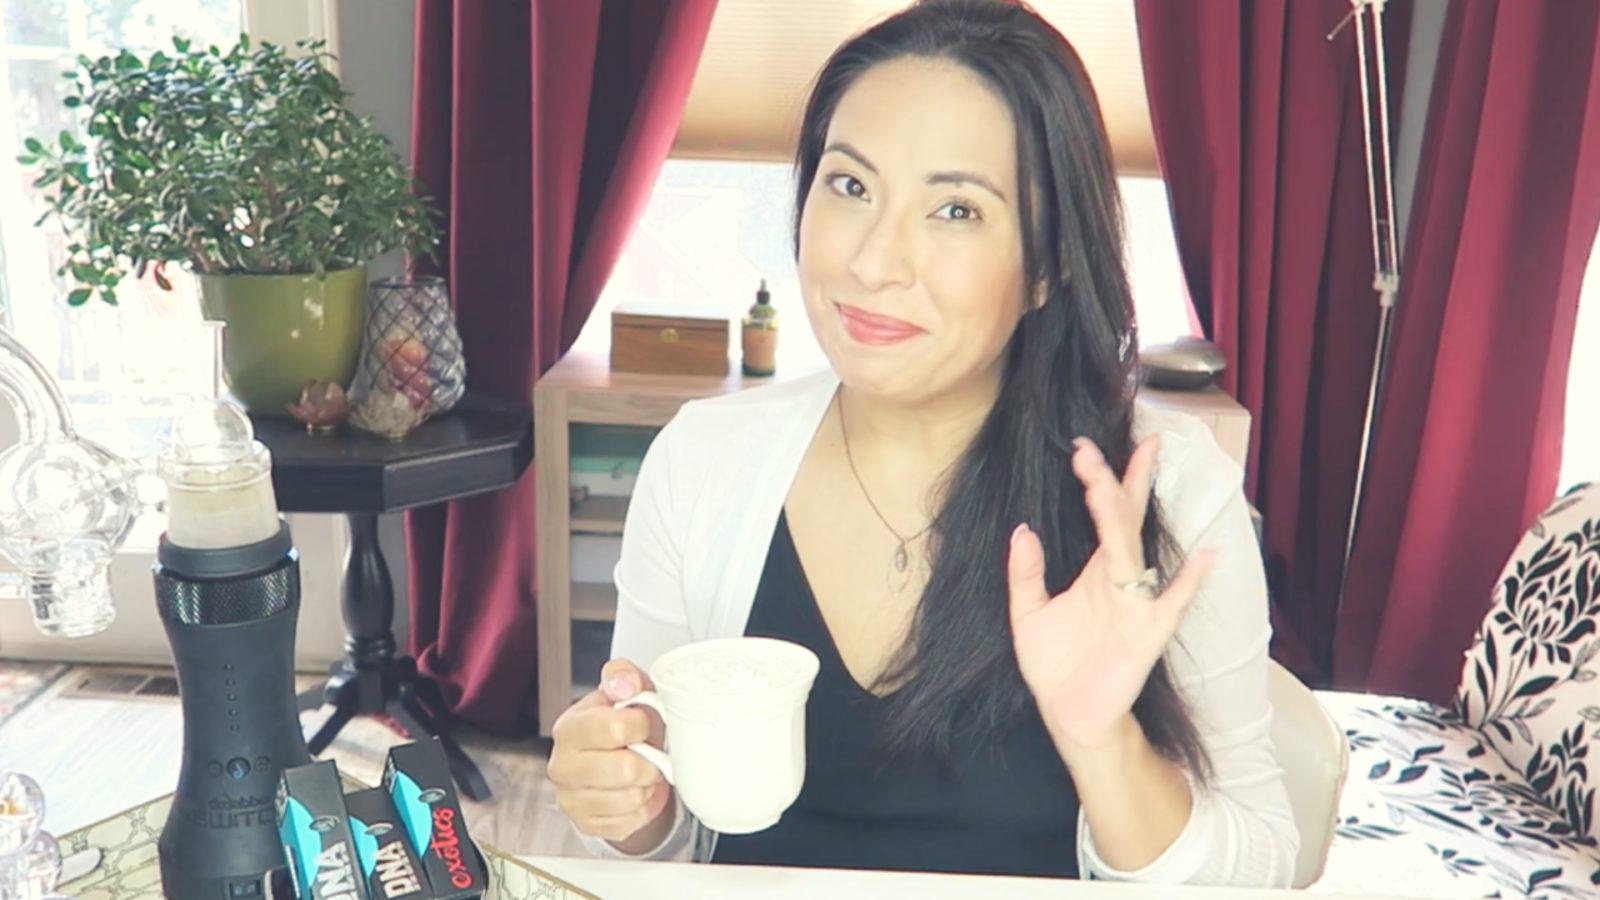 Coffee Talk 20 | Stoney Wake & Bake Sesh